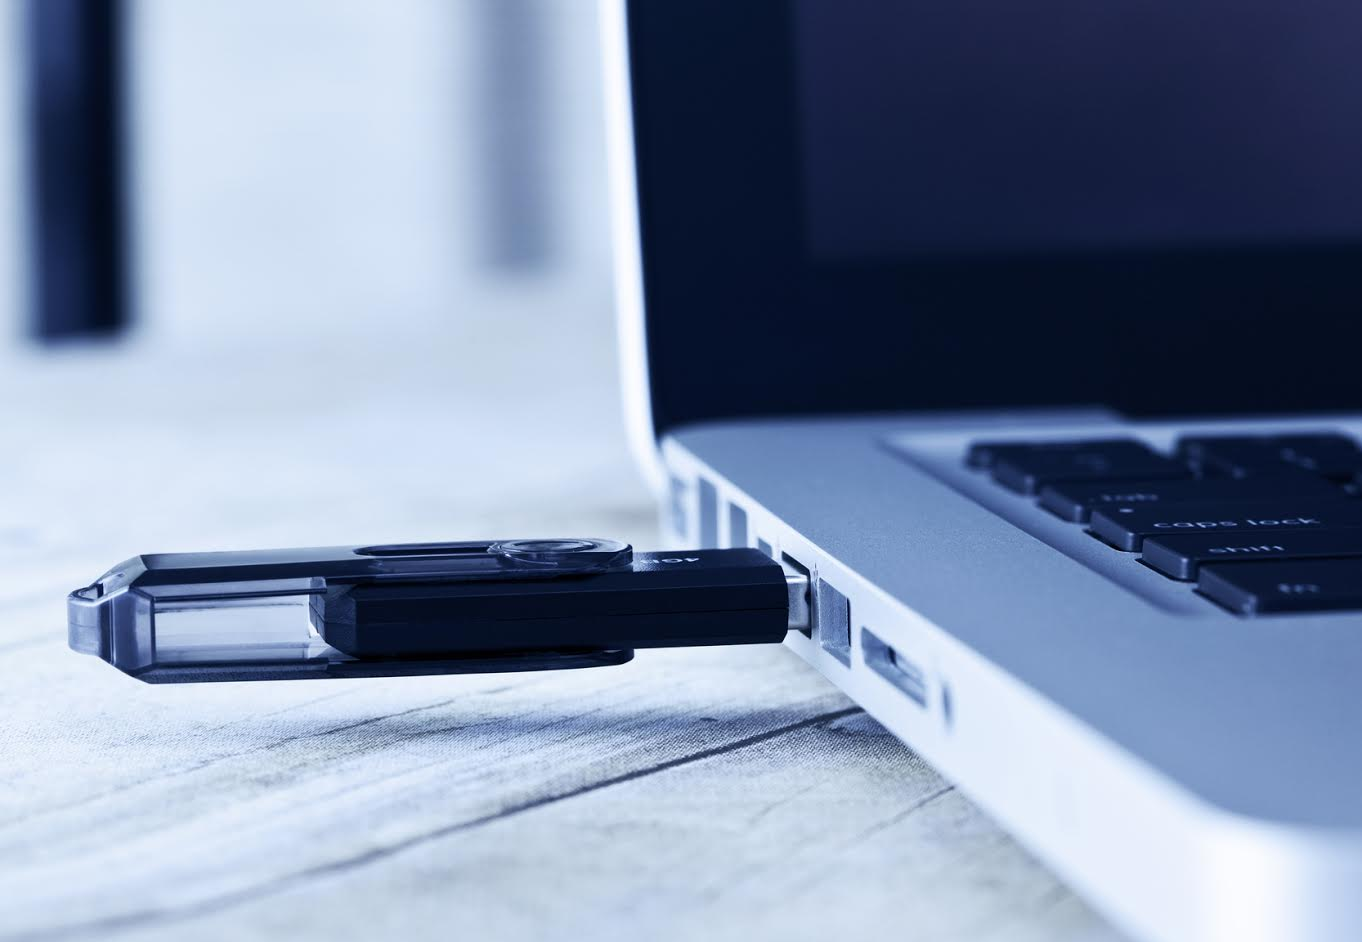 Pen drives used in OCC data breach